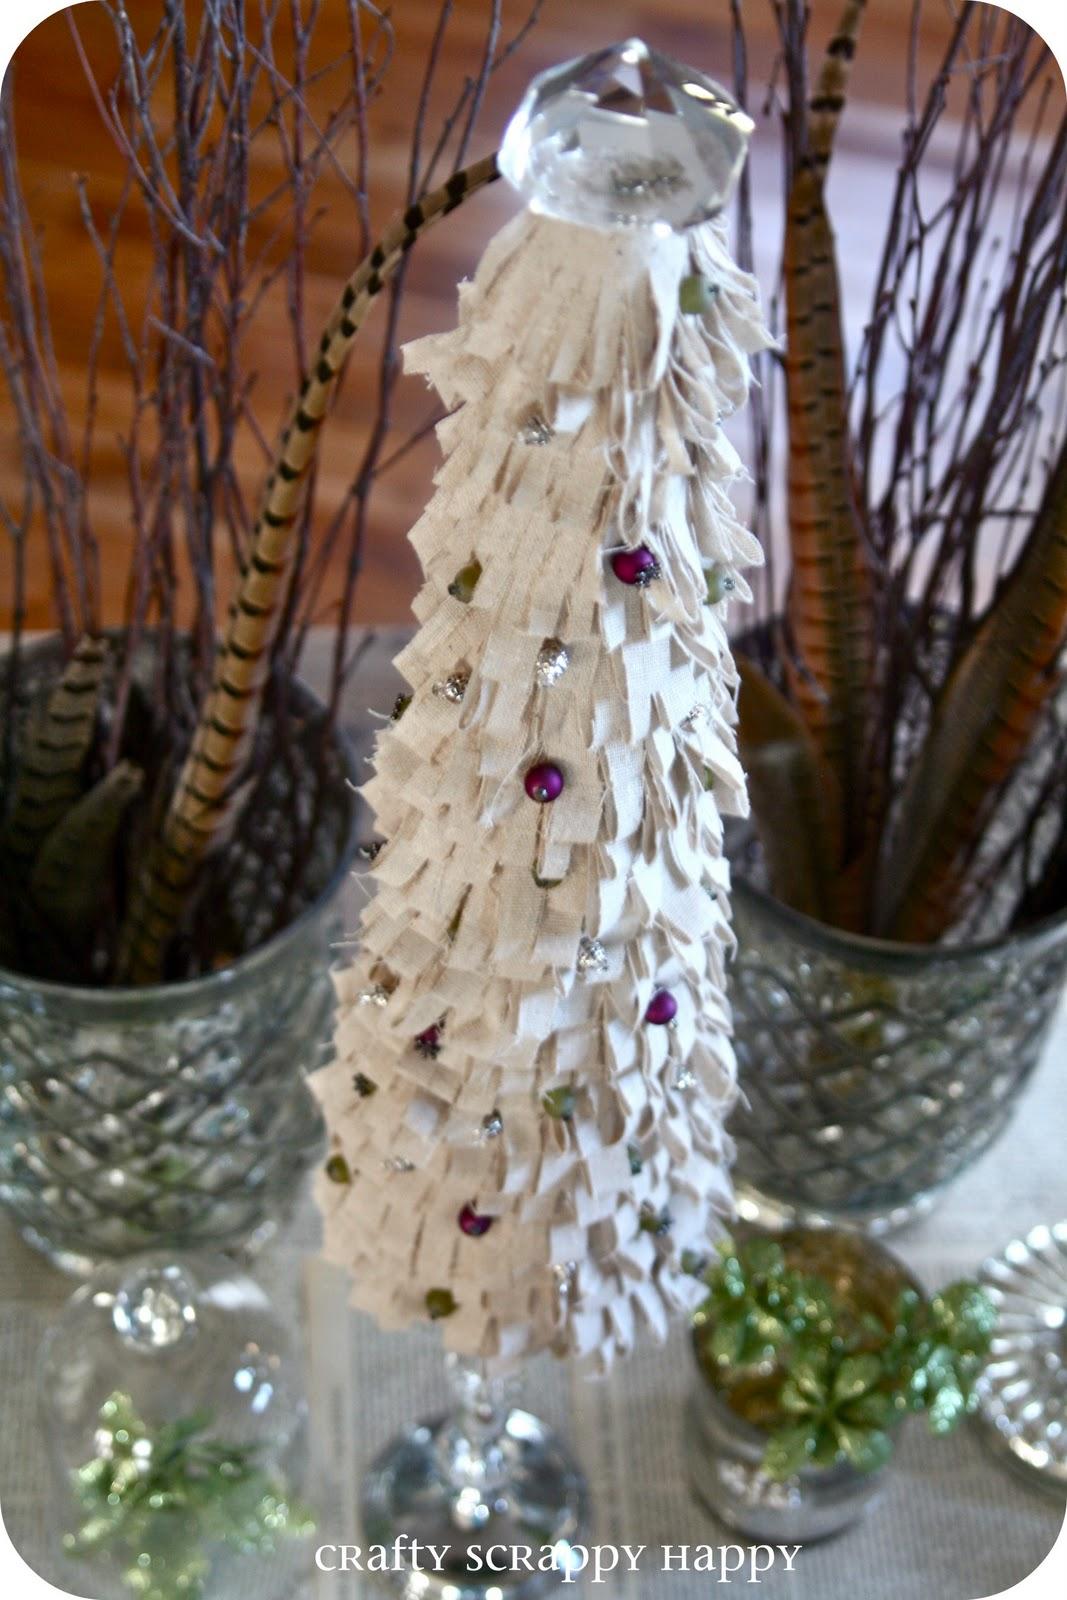 shabby chic ruffled tree topiary featuring jaime lyn at crafty scrappy happy handmade holidays project no 24 - Handmade Shabby Chic Christmas Decorations